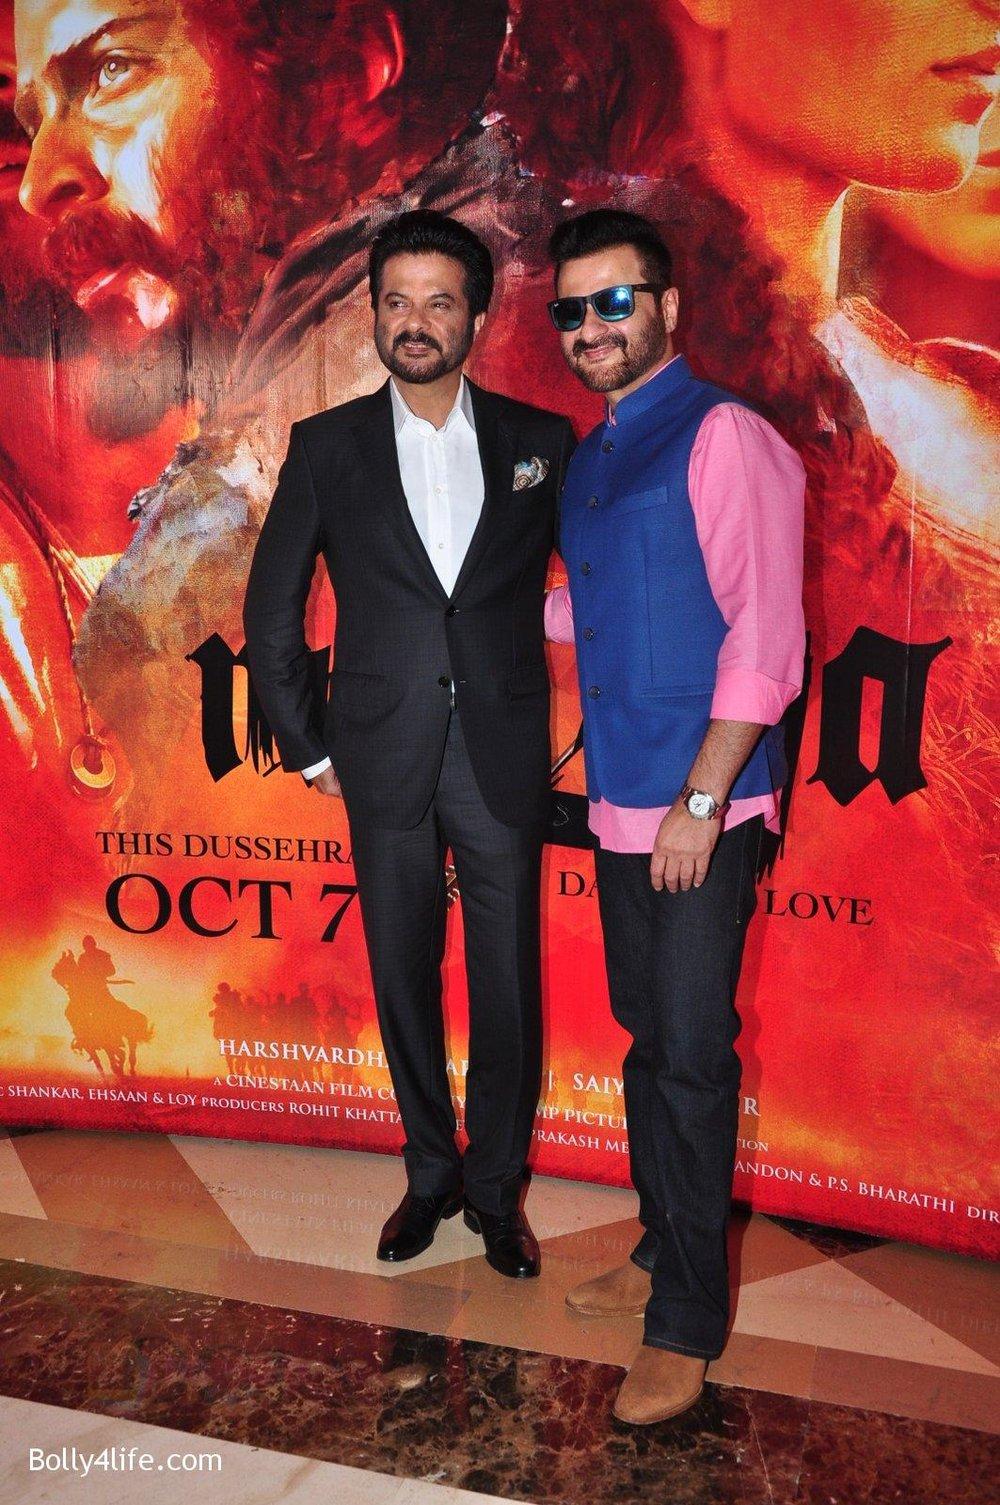 Anil-Kapoor-Sanjay-Kapoor-at-the-Audio-release-of-Mirzya-on-13th-Sept-2016-32.jpg